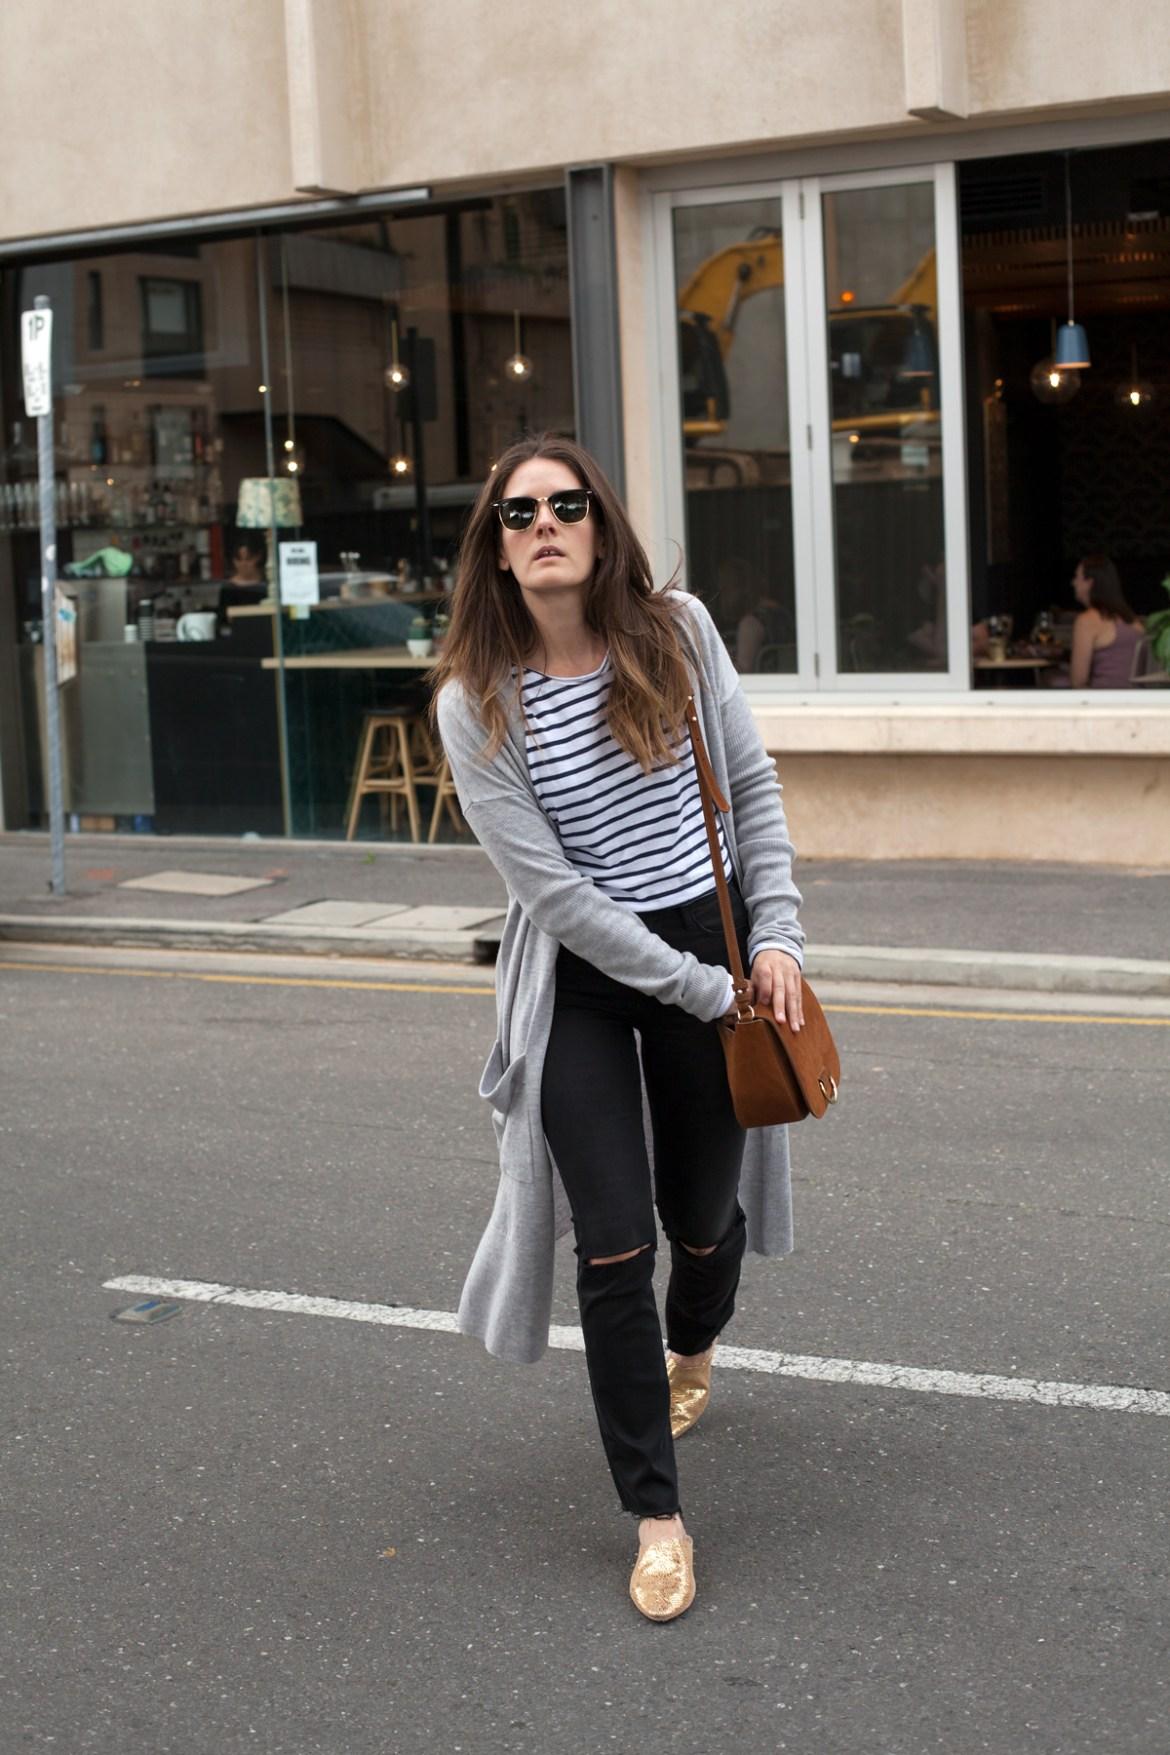 Sassind gold leather babouche slides, grey longline merino cardigan, striped tee, Frame denim jeans worn by Inspiring Wit fashion blogger Jenelle